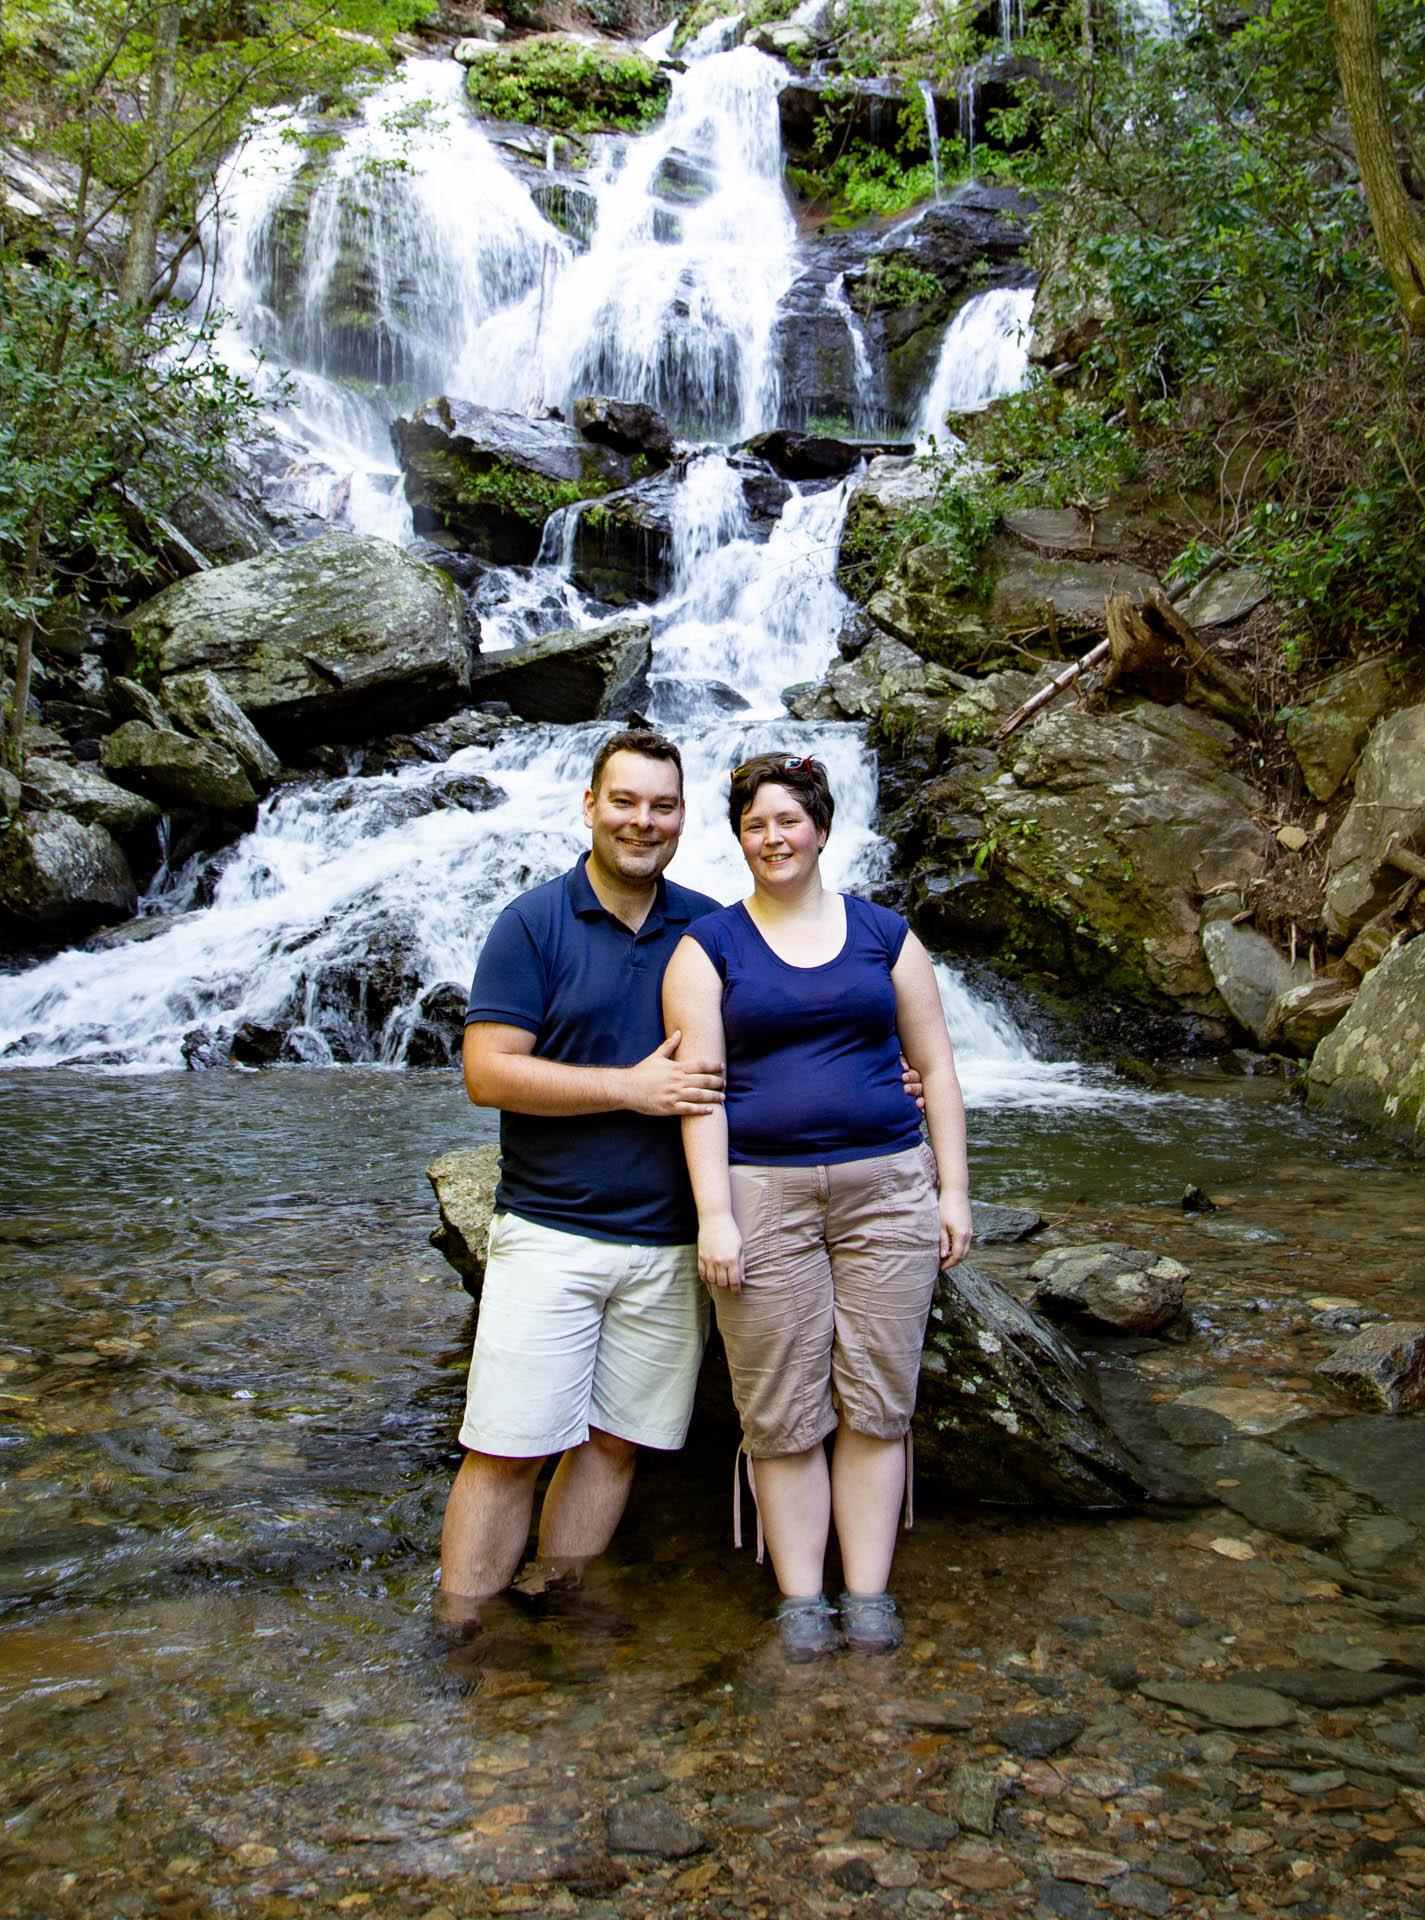 waterfall-alexncat